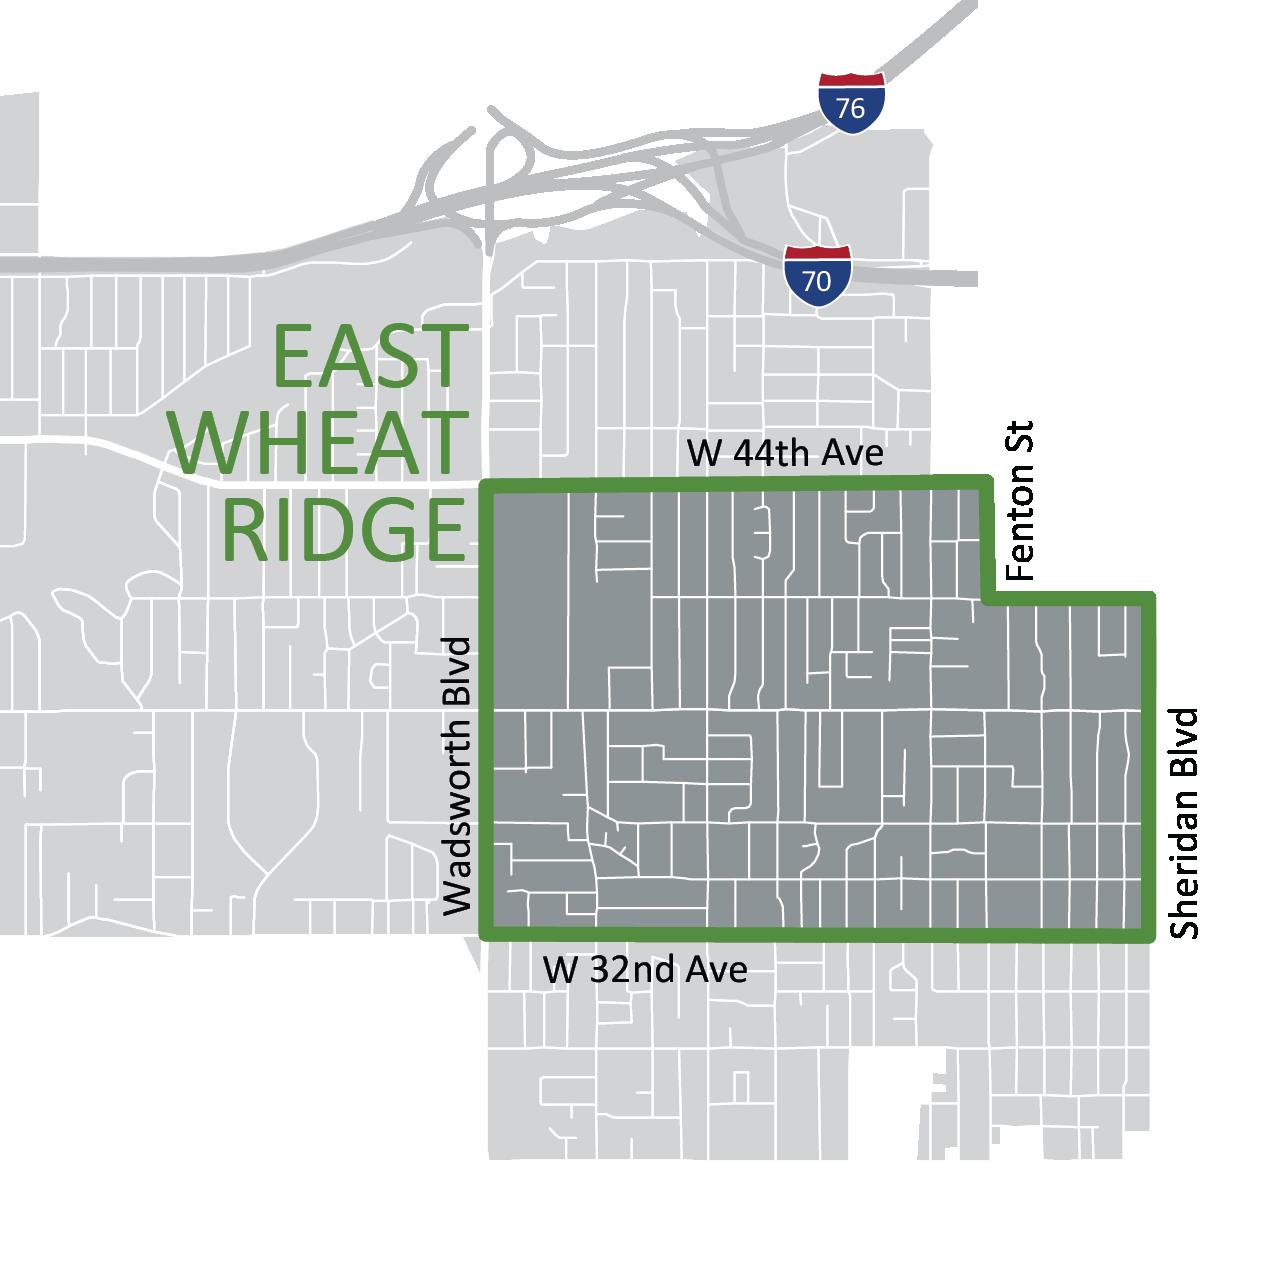 Map of East Wheat Ridge